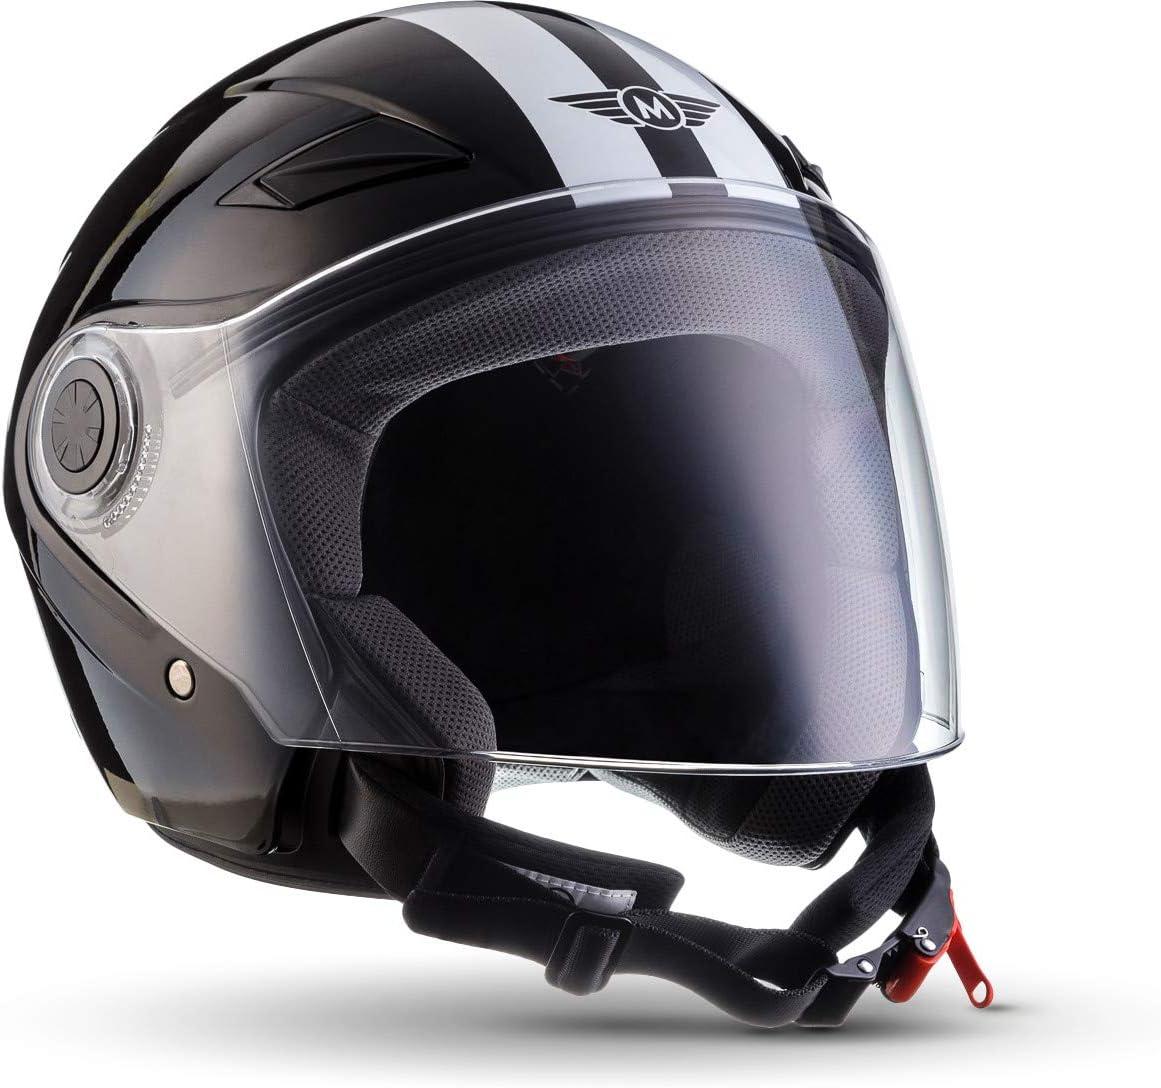 MOTO U52 - Racing black - Casco Moto Demi-Jet con Visera Vespa Scooter Piloto Jet negro - S (55-56cm)